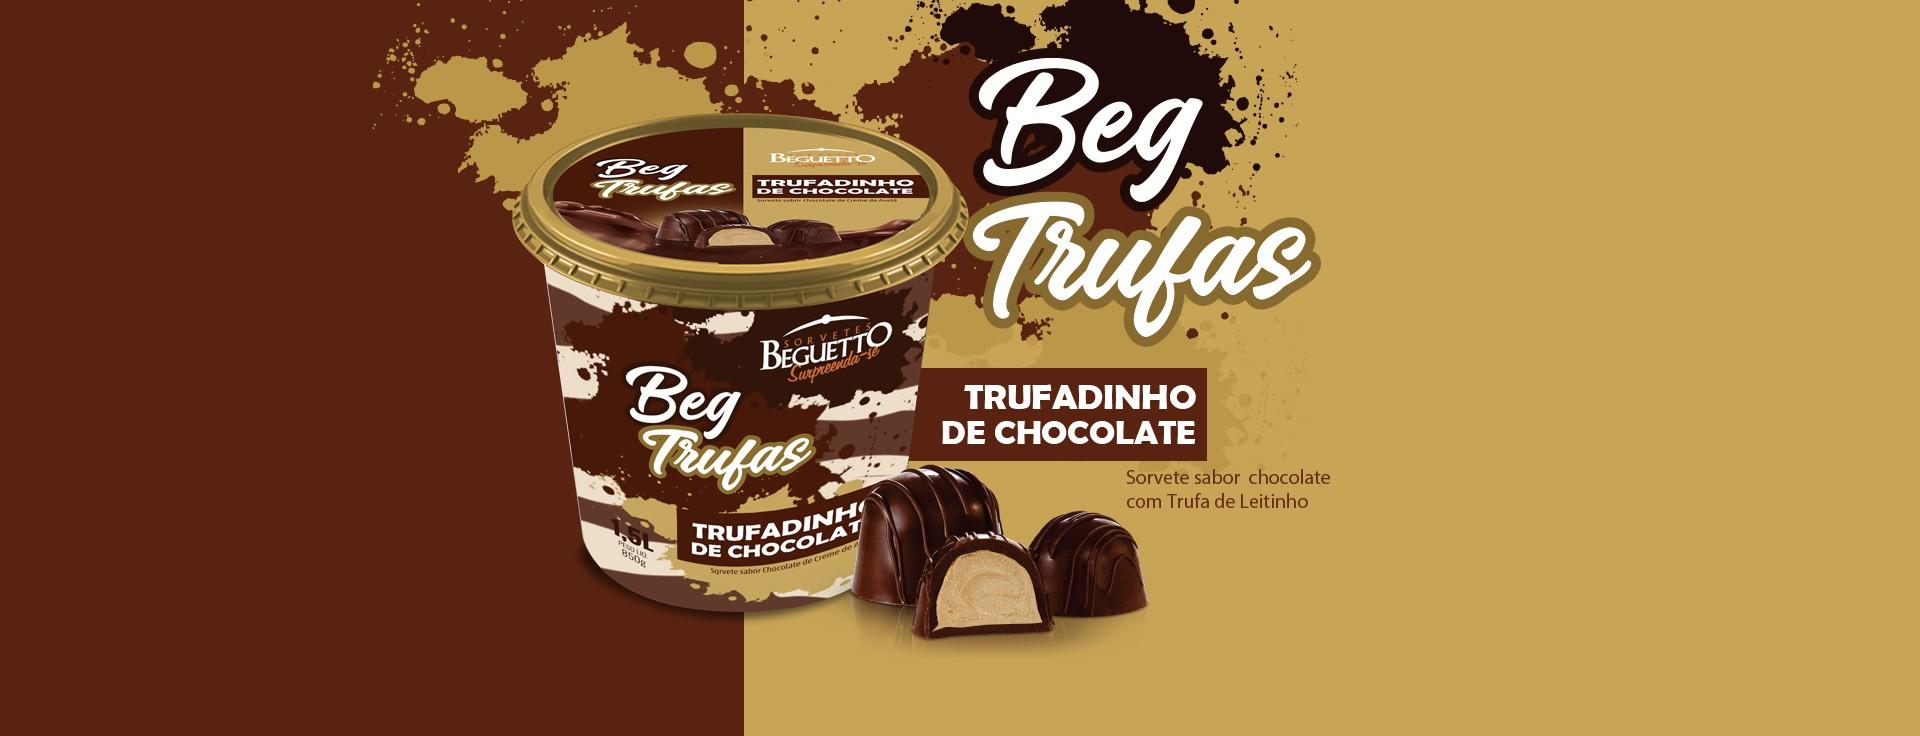 BEGTRUFAS - TRUFADINHO DE CHOCOLATE - 1,5L